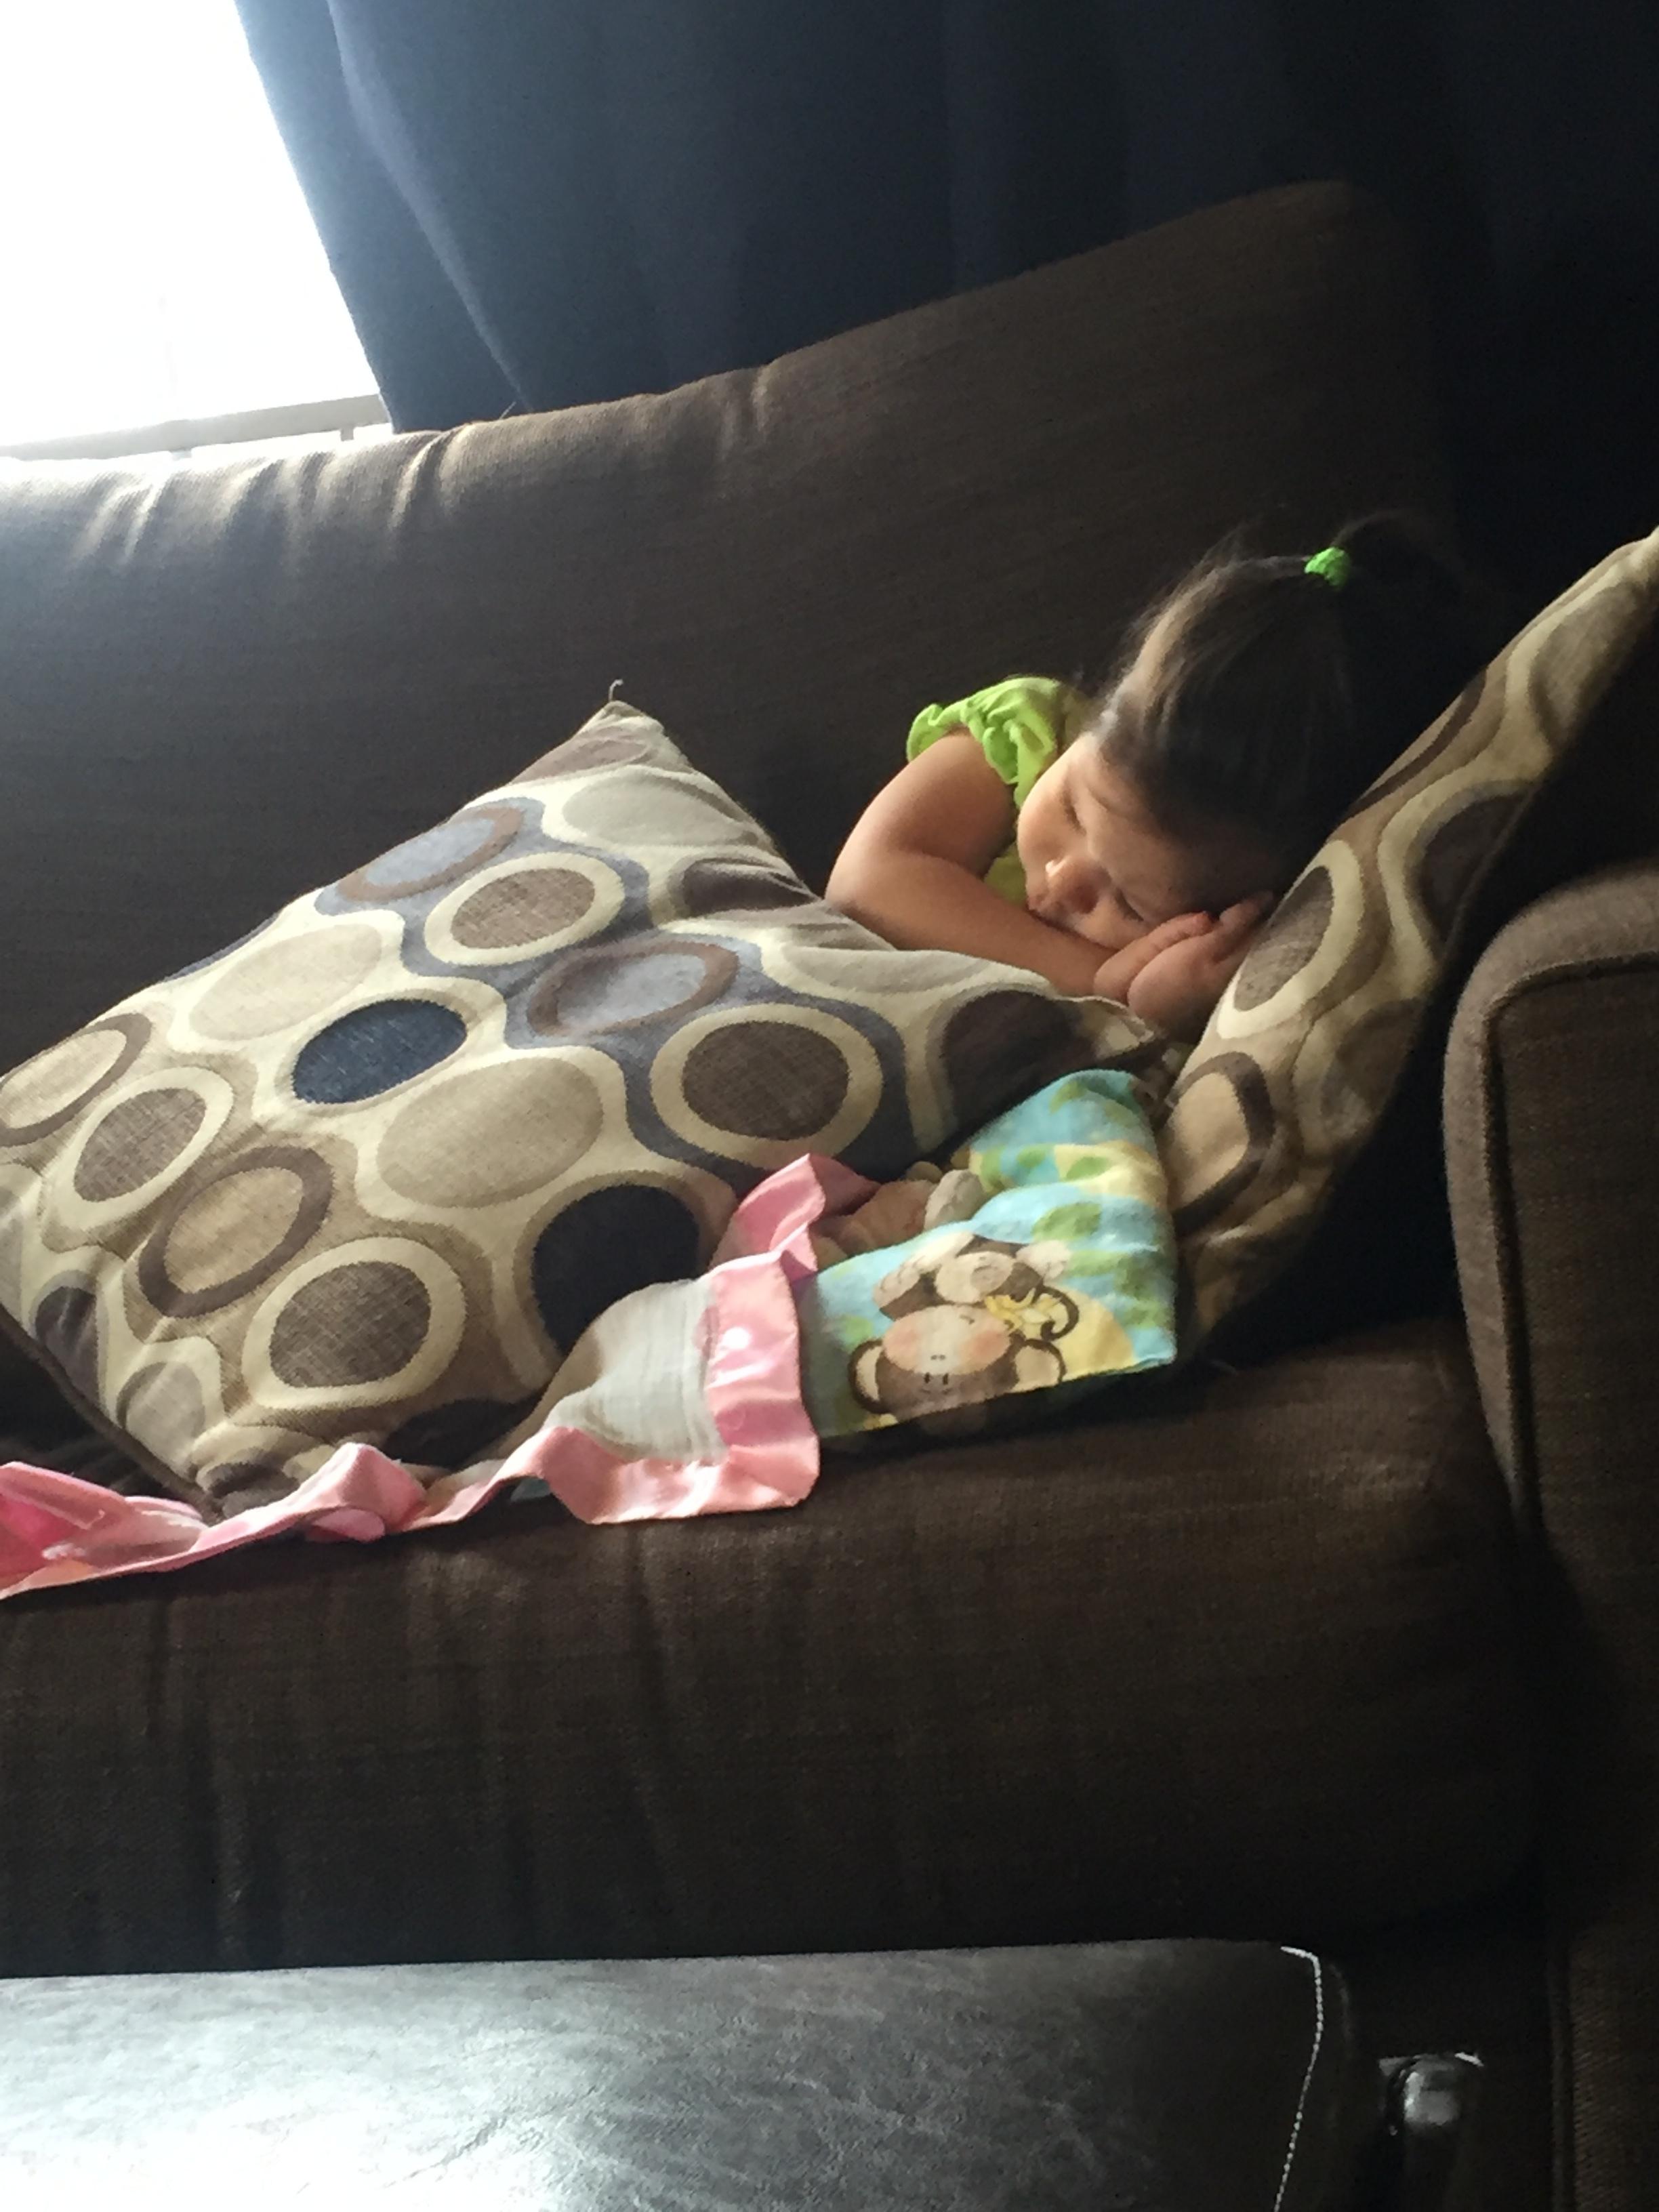 Always pretend sleeping